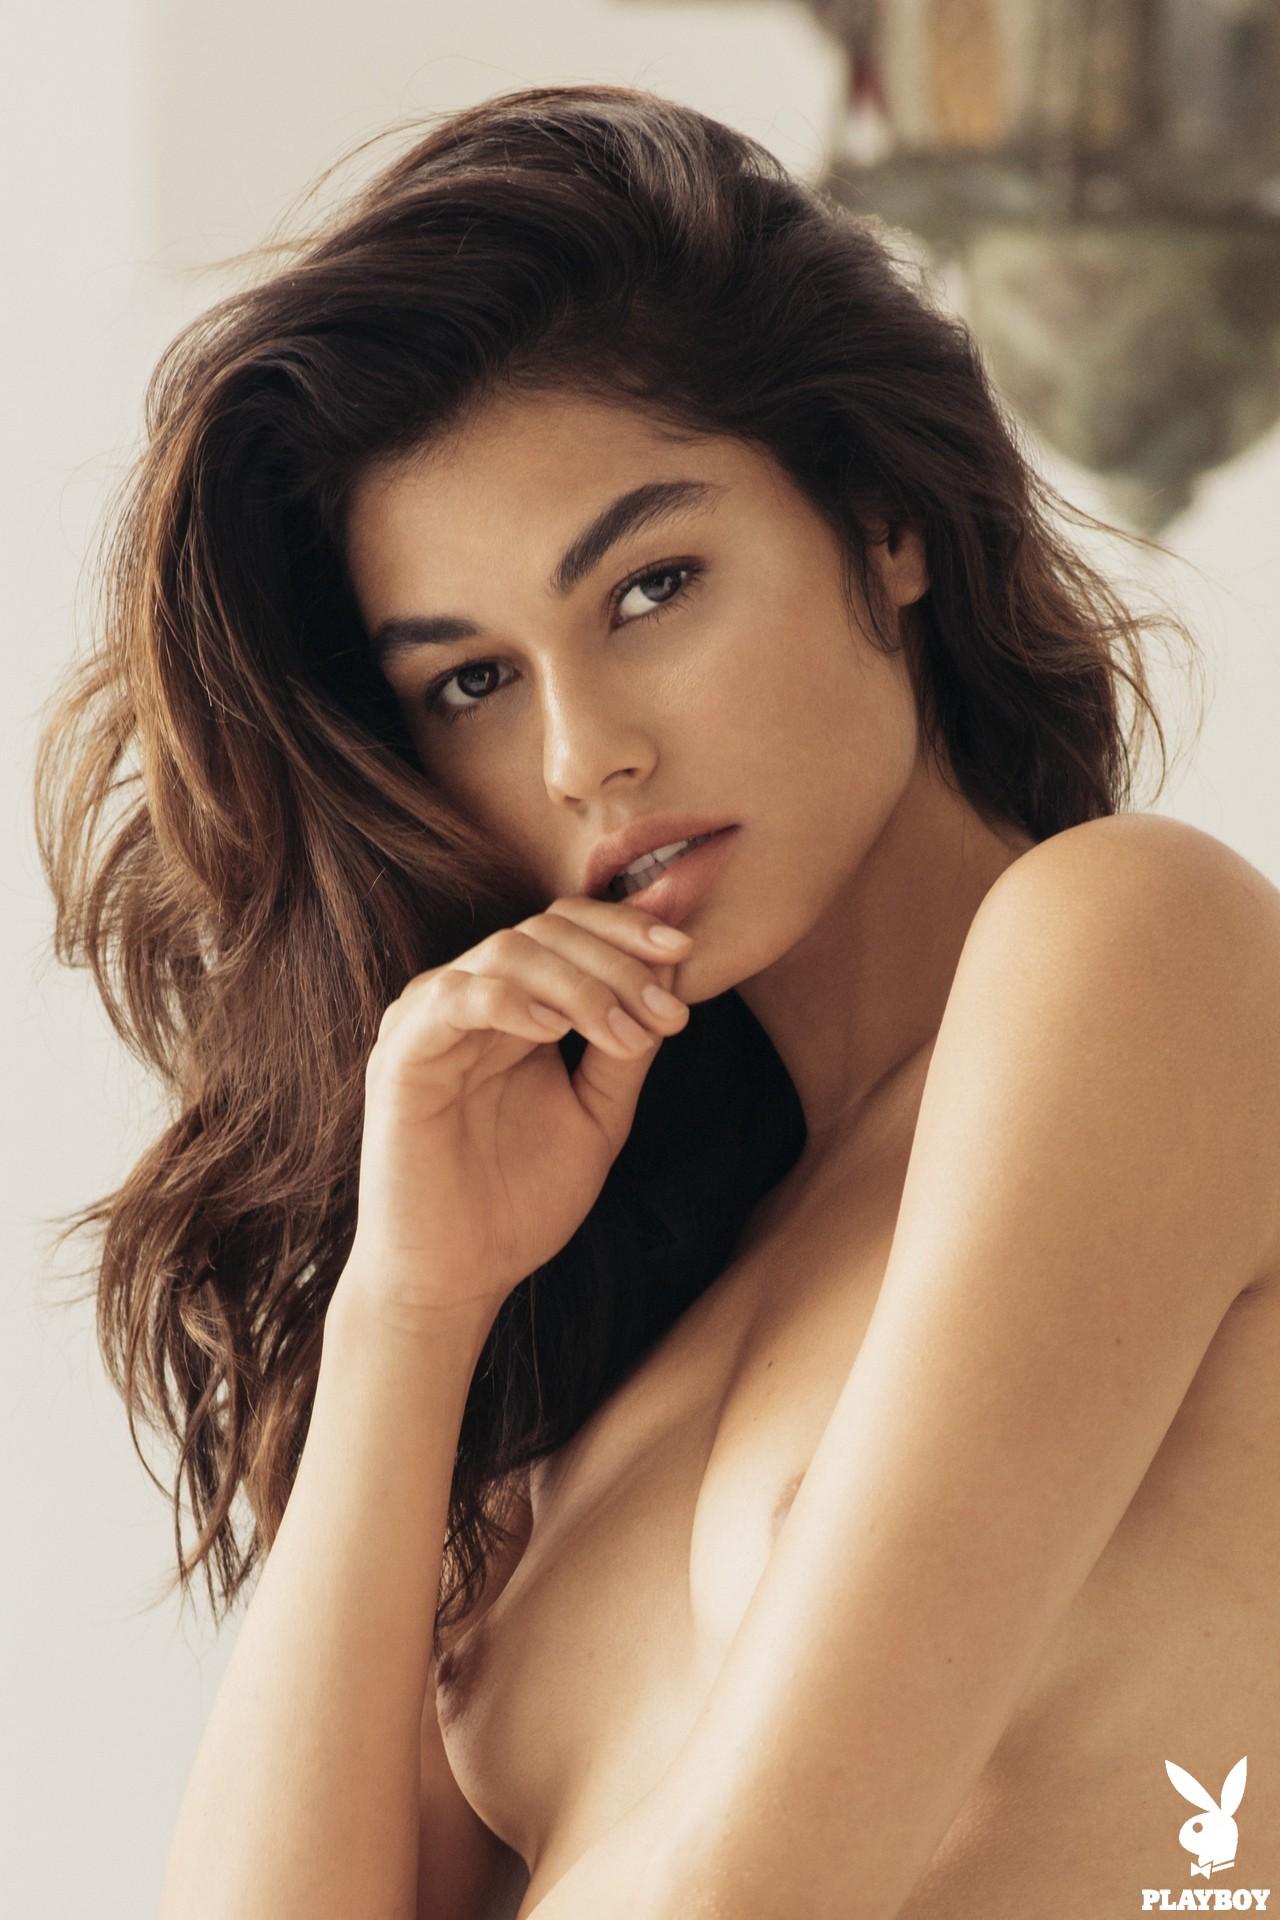 Playmate August 2018: Lorena Medina - Playboy Plus 1